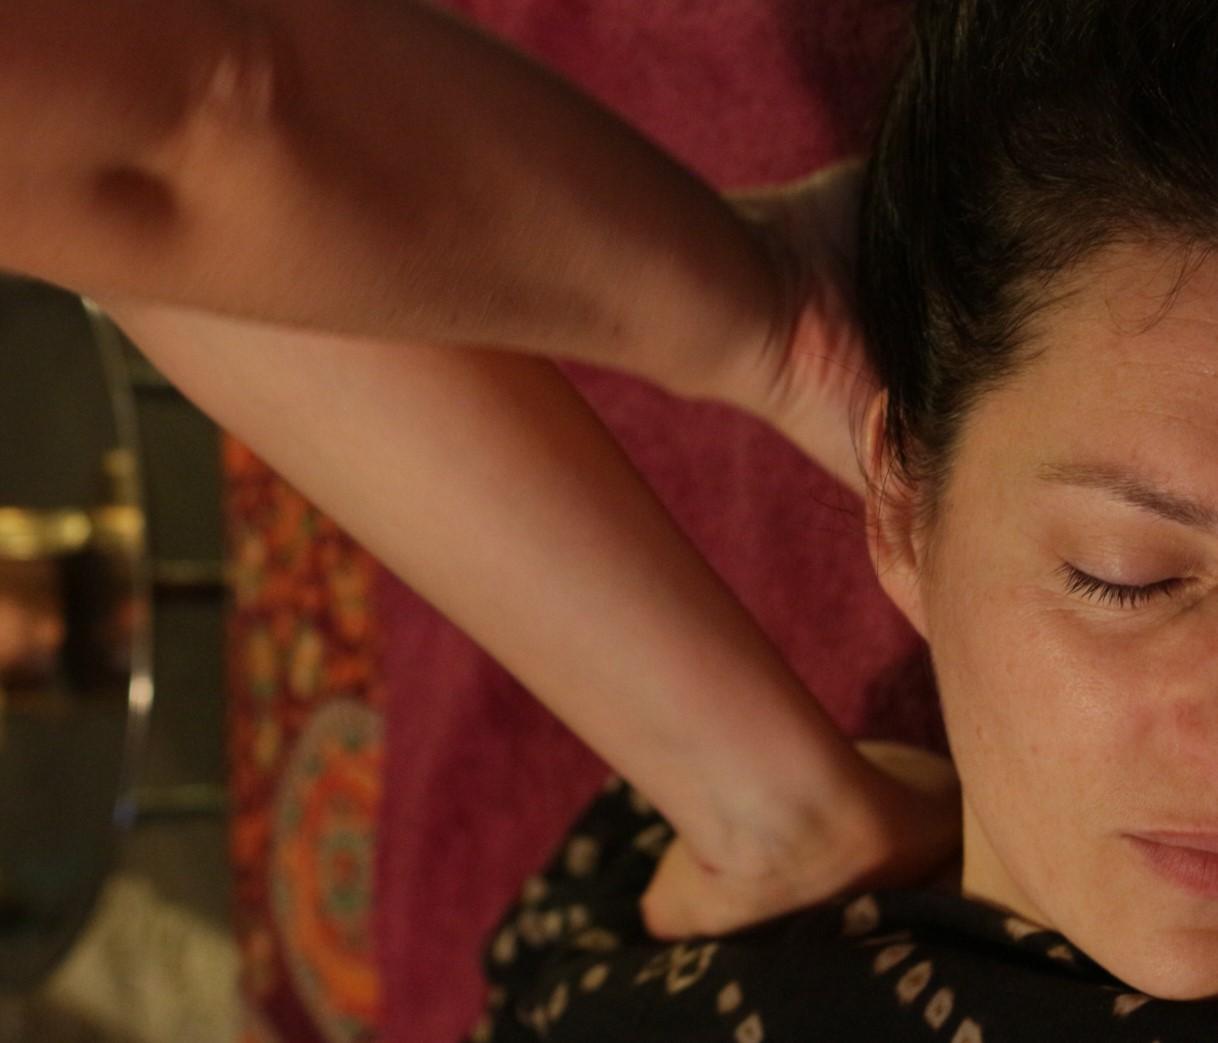 shiro abhyanga dos cuir chevelu iabhyanga massage femme enceint pré natal post natal massage soin pornichet la baule Saint-Nazaire ayurveda massage ayurvédique massages